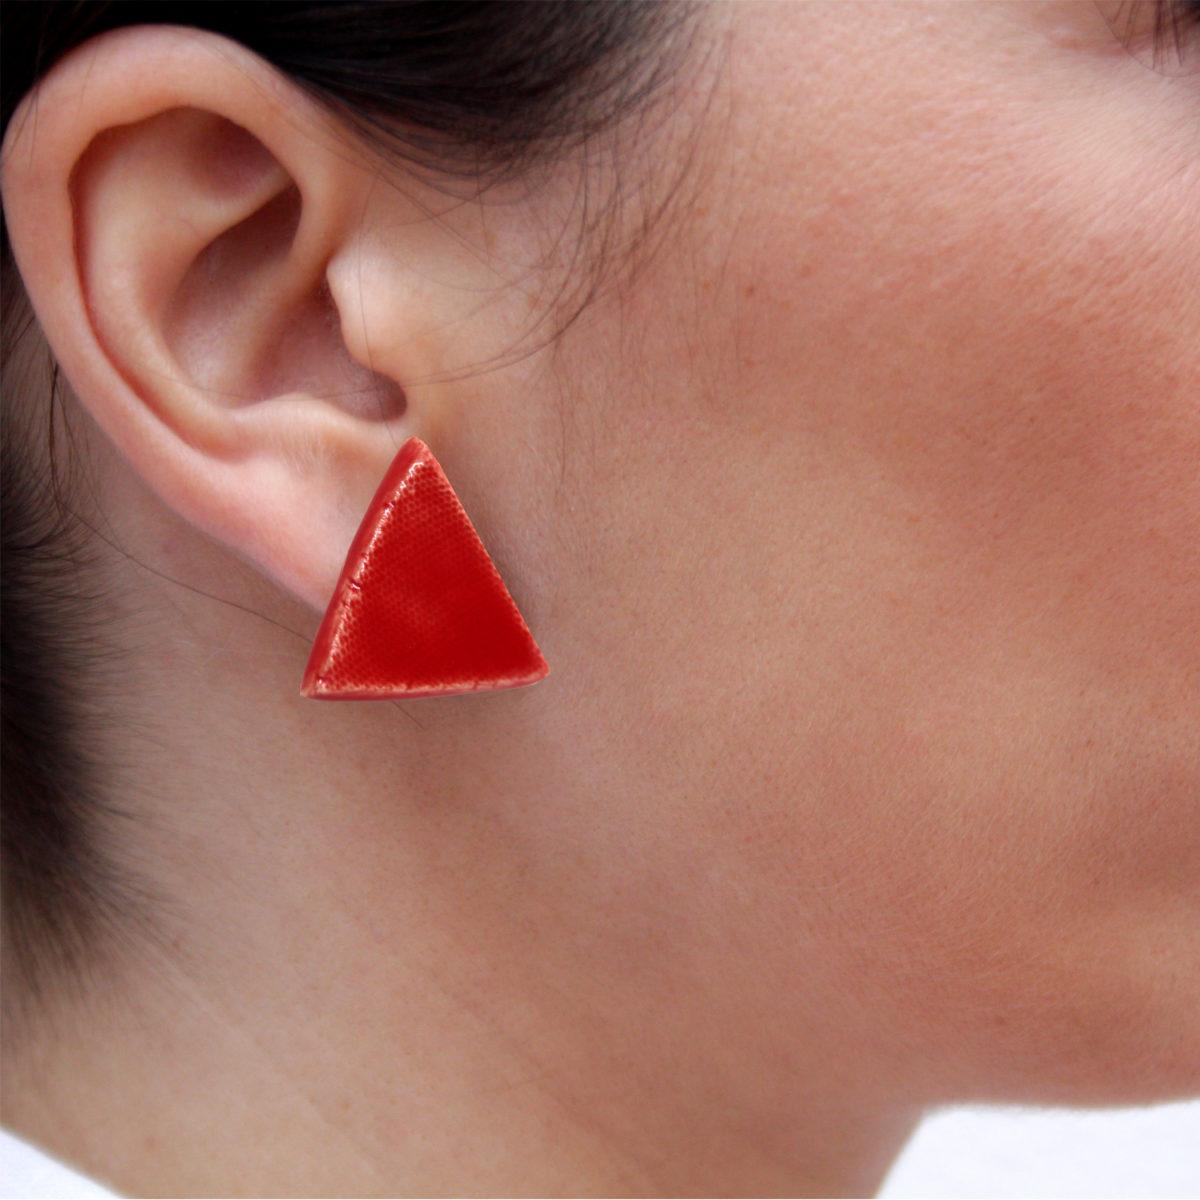 Pendientes de cerámica triangulares hechos a mano color rojo intenso Bowtery minimalista. Minimalist handmade ceramic triangle earrings red